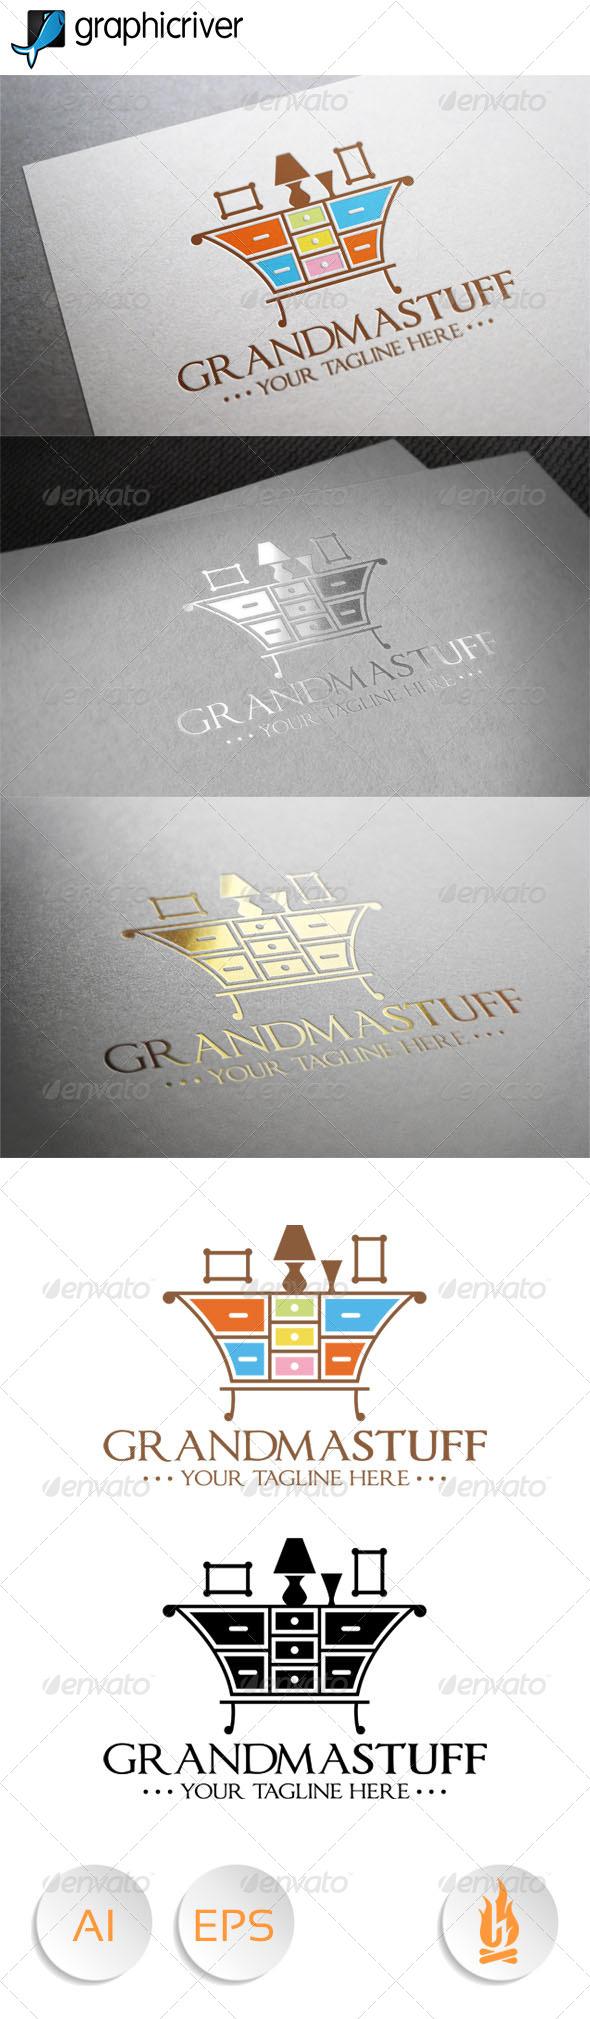 GraphicRiver Grandmastuff Logo 7815275